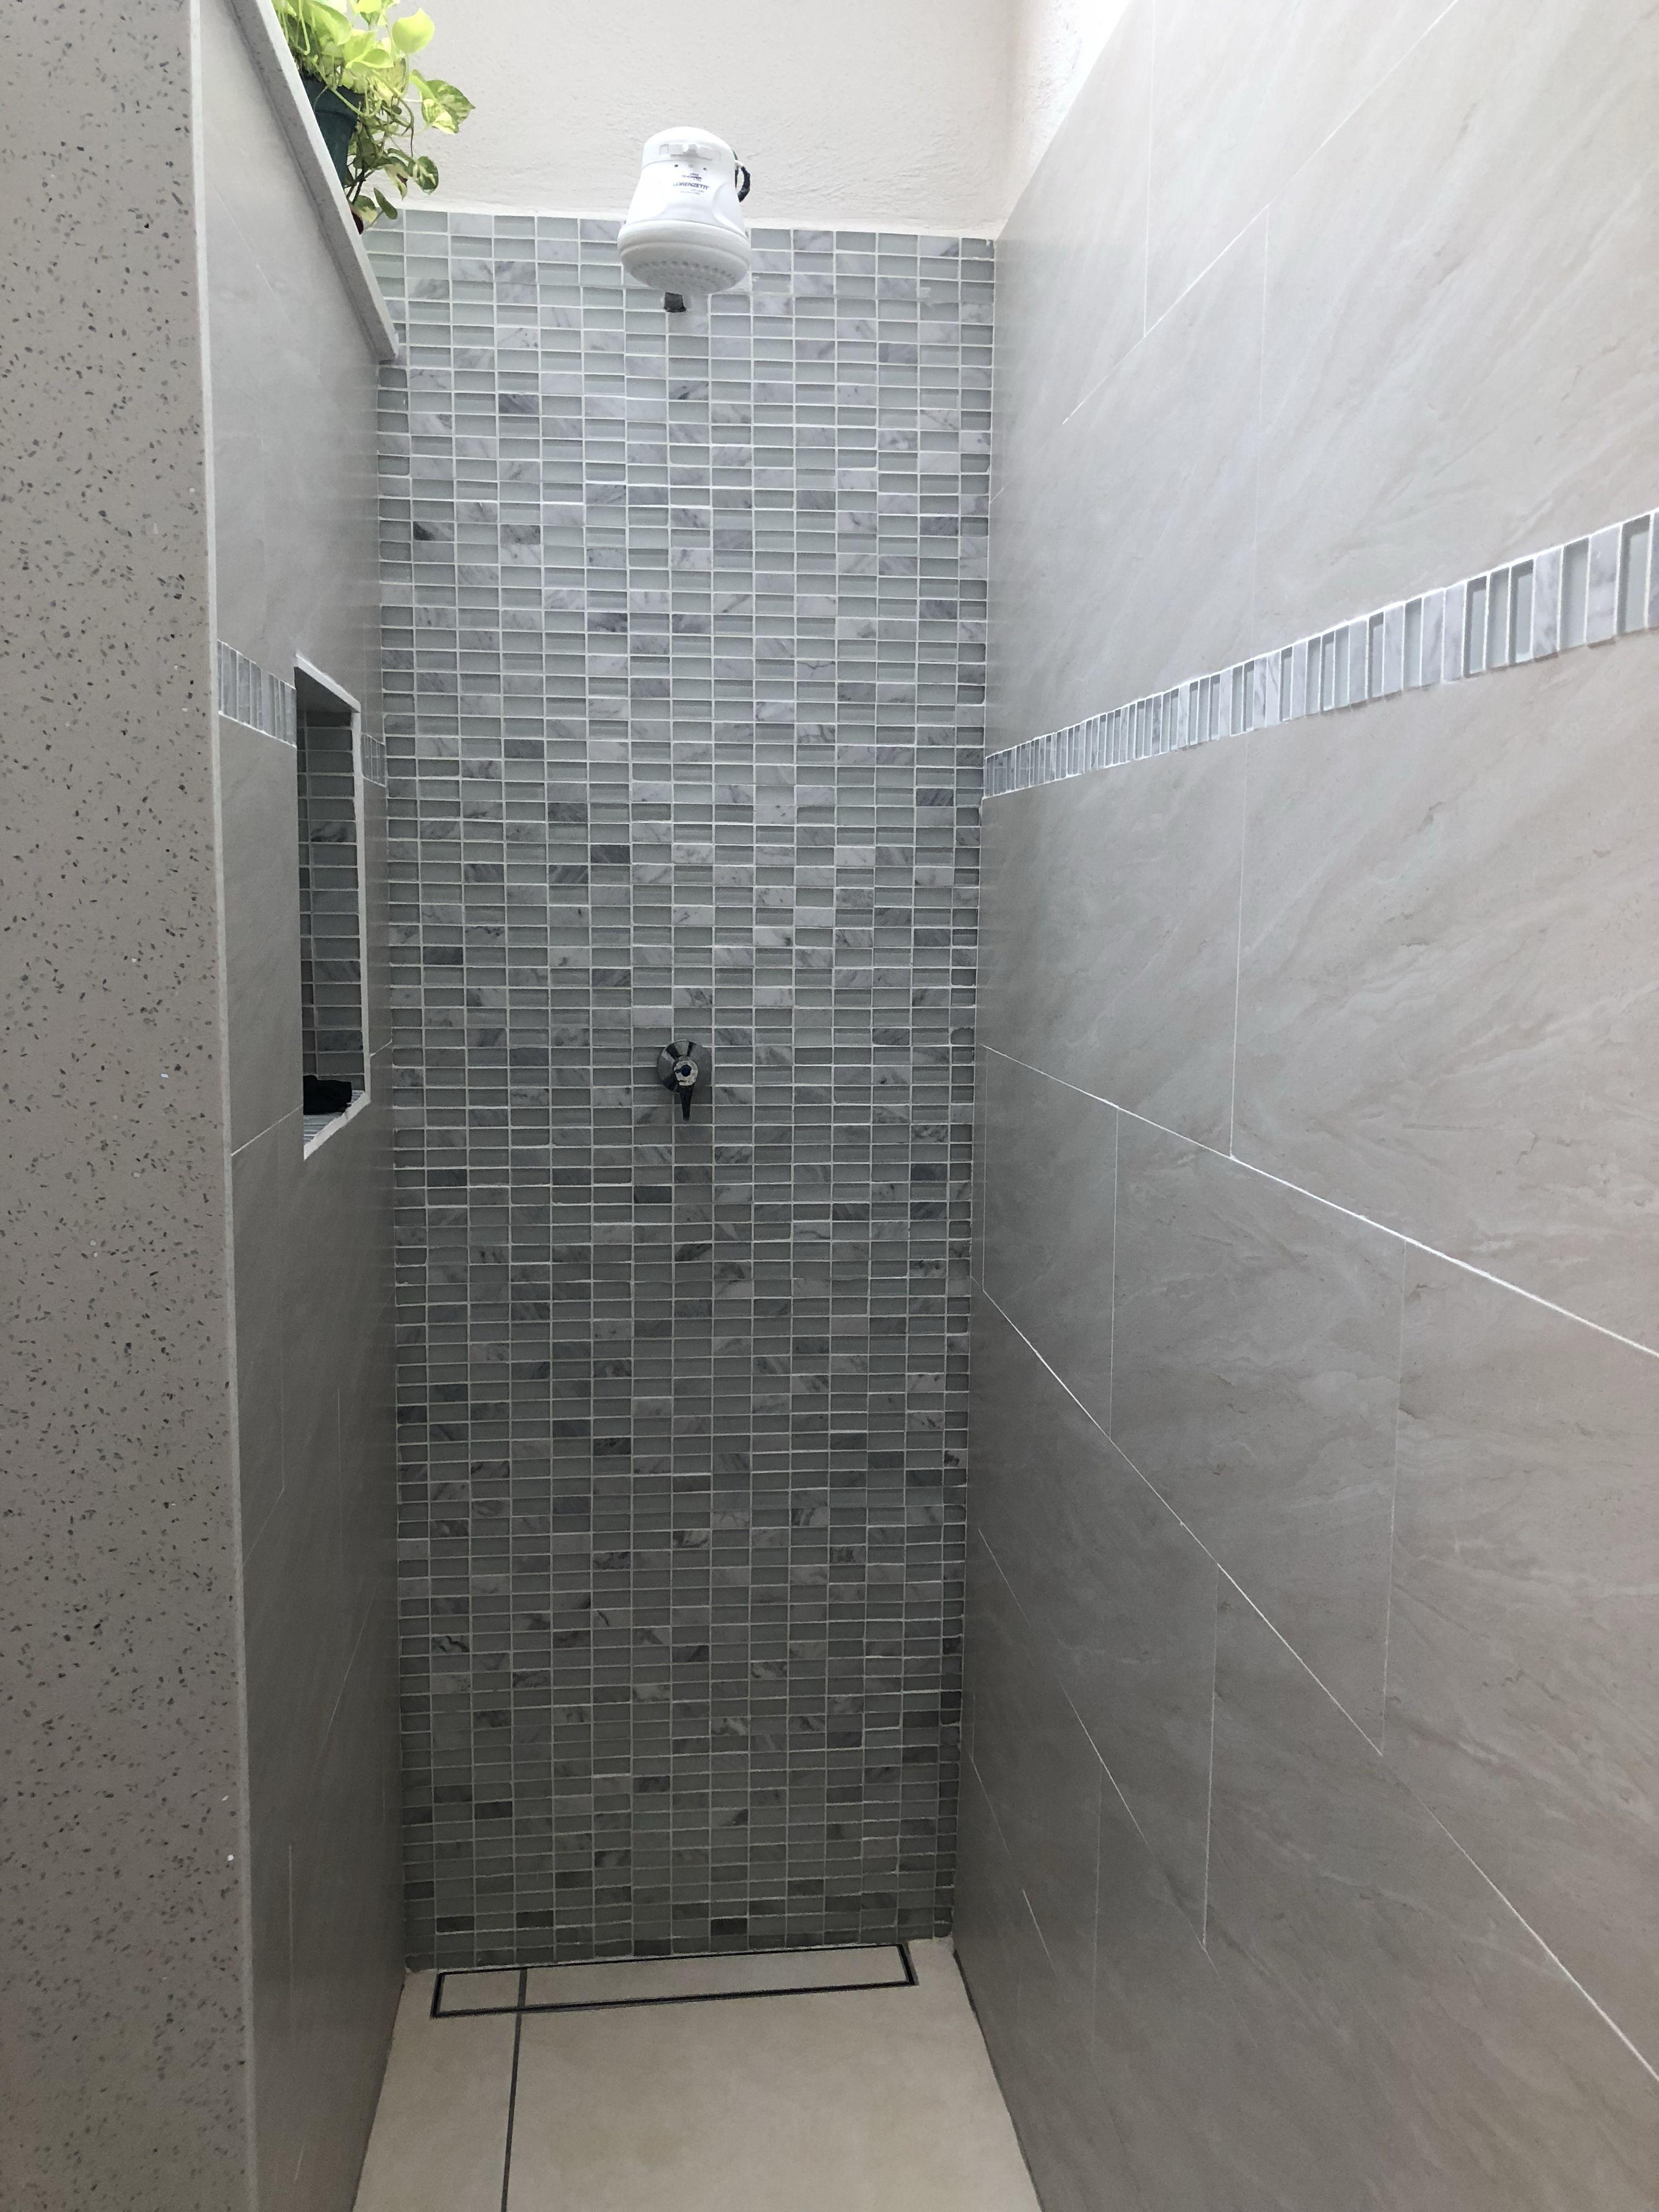 Calentadores Para Cuartos De Bano.Calentador De Agua Porcellanato Mosaico Para Ducha